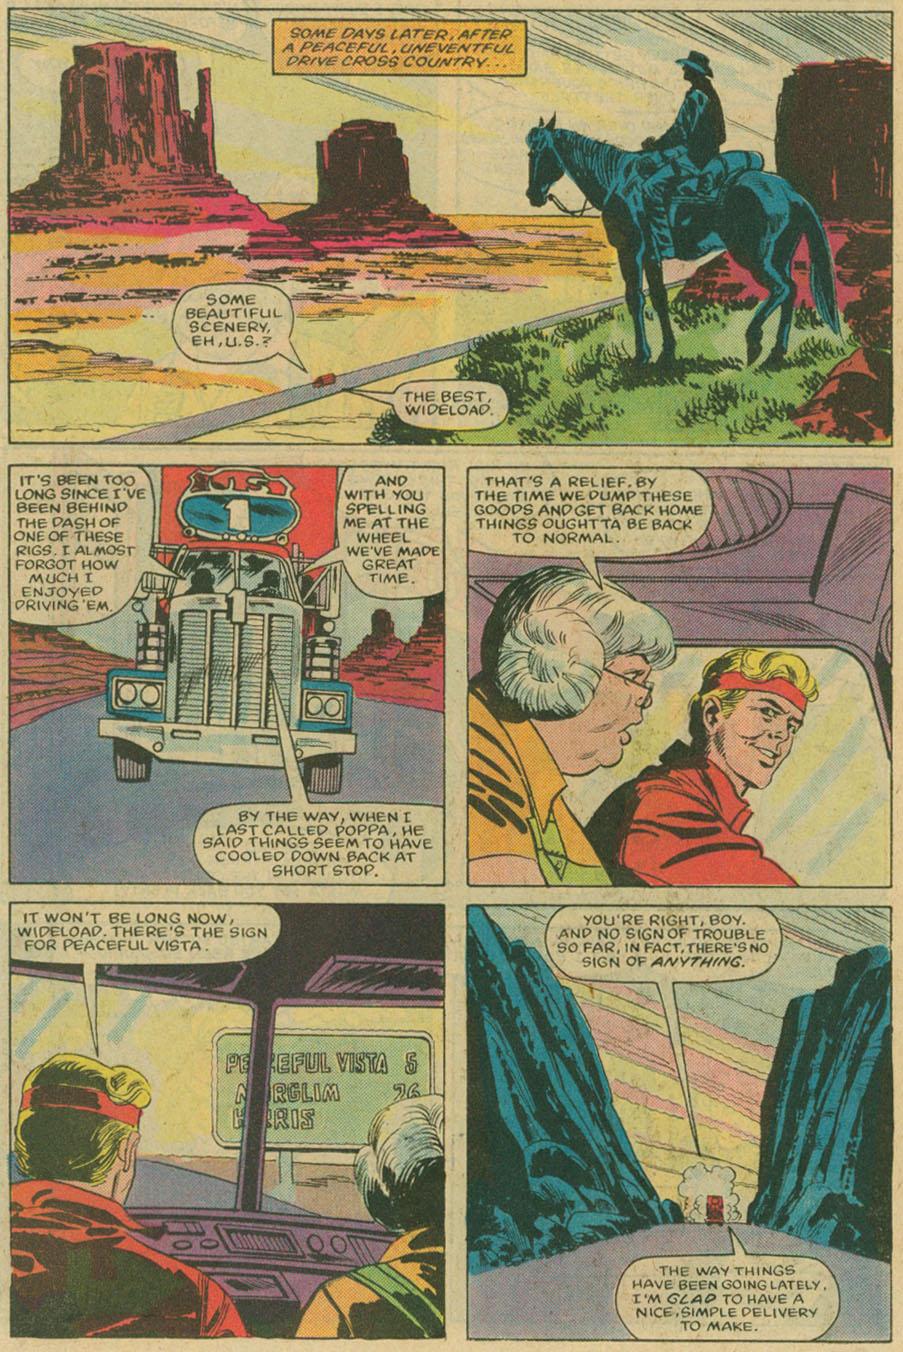 Read online U.S. 1 comic -  Issue #6 - 12